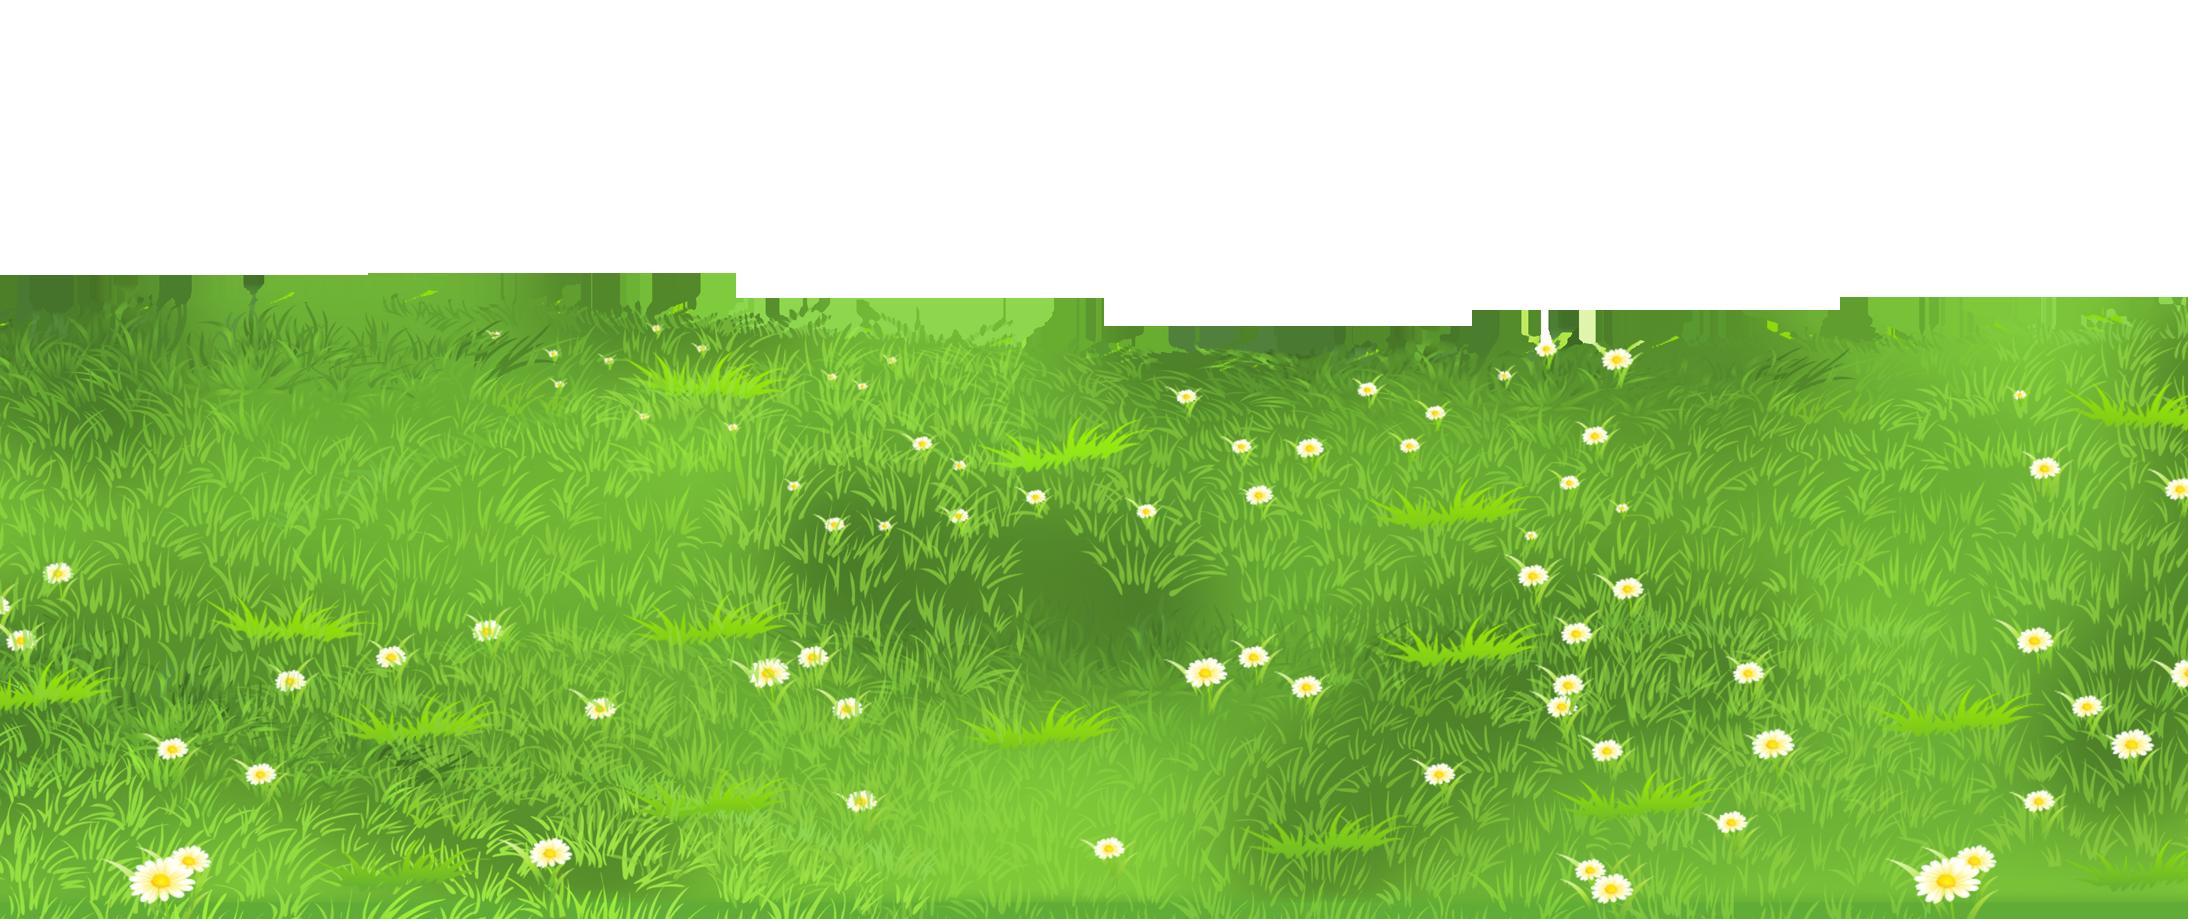 Grass ground with.